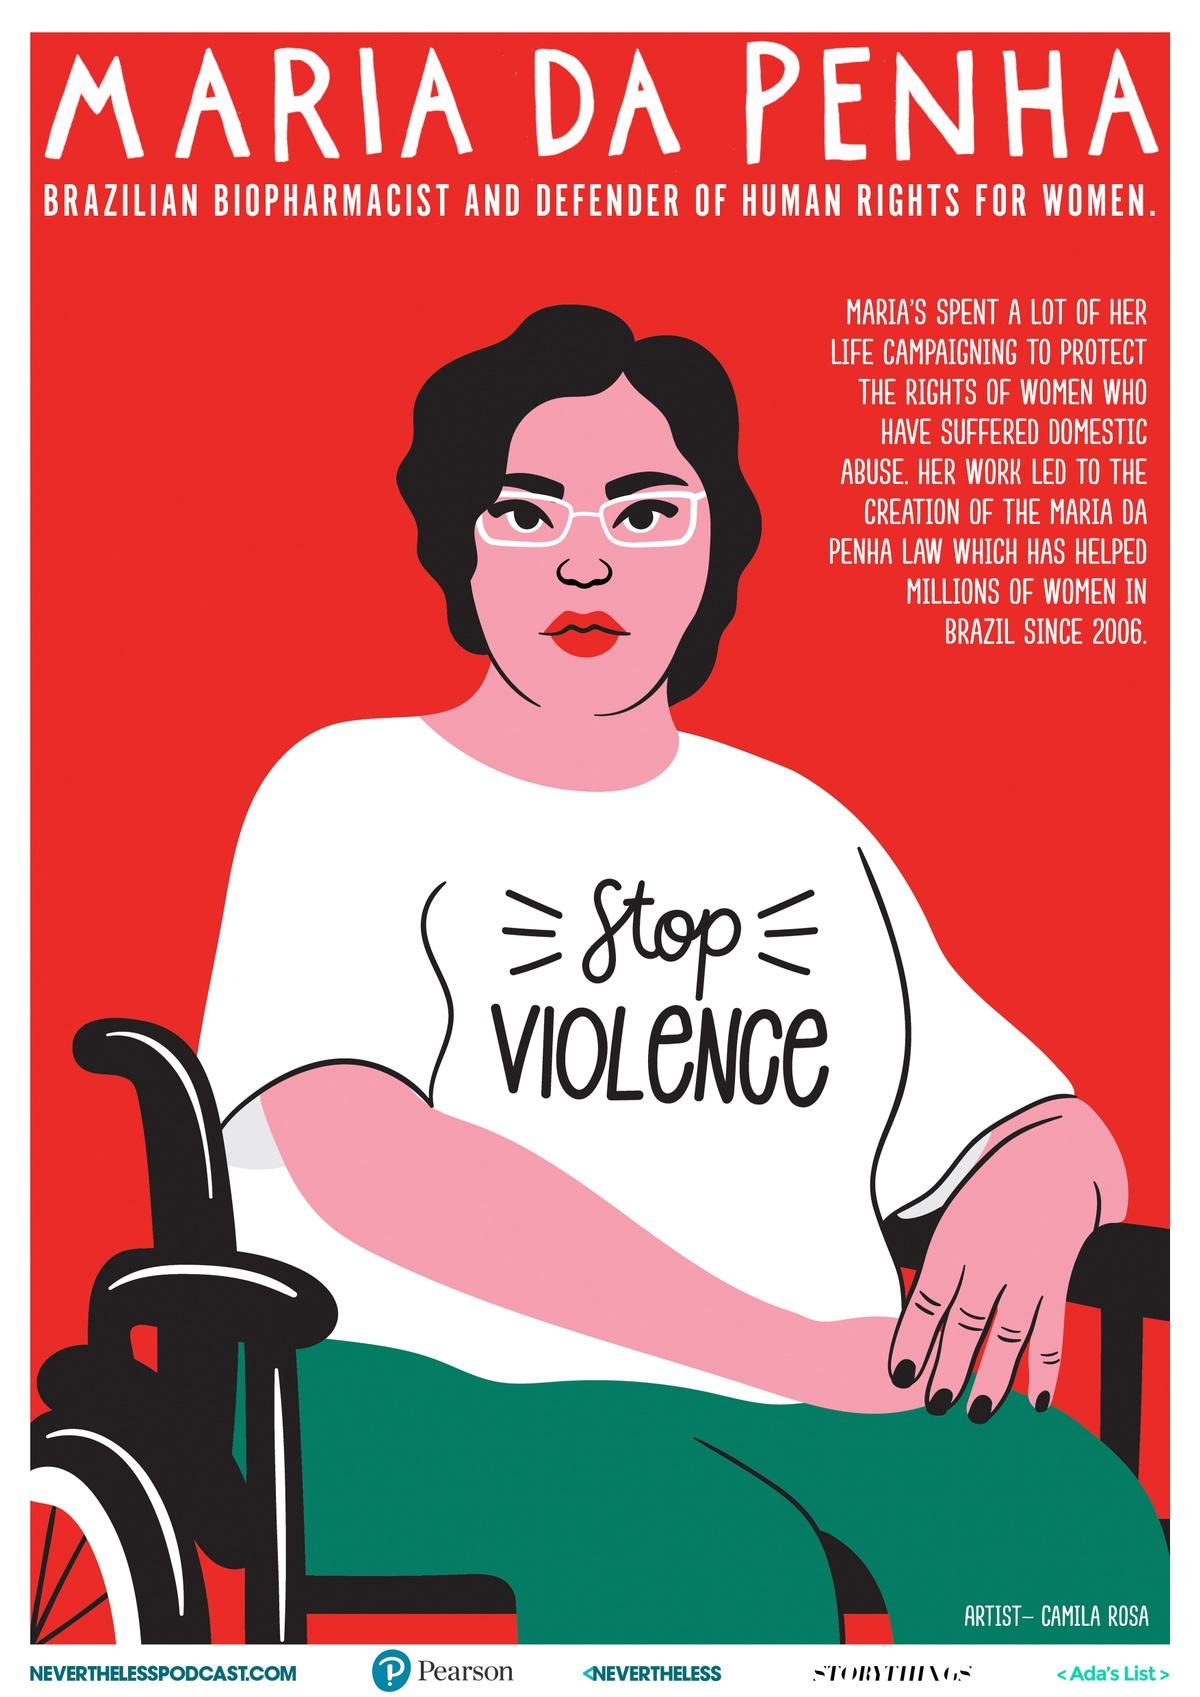 illustrated poster of Maria Da Penha by Camila Rosa